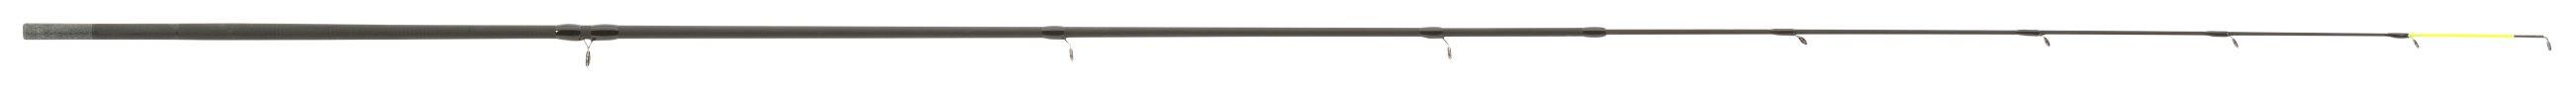 Saenger Feederový set s prutem 3,60 m / do 120 g